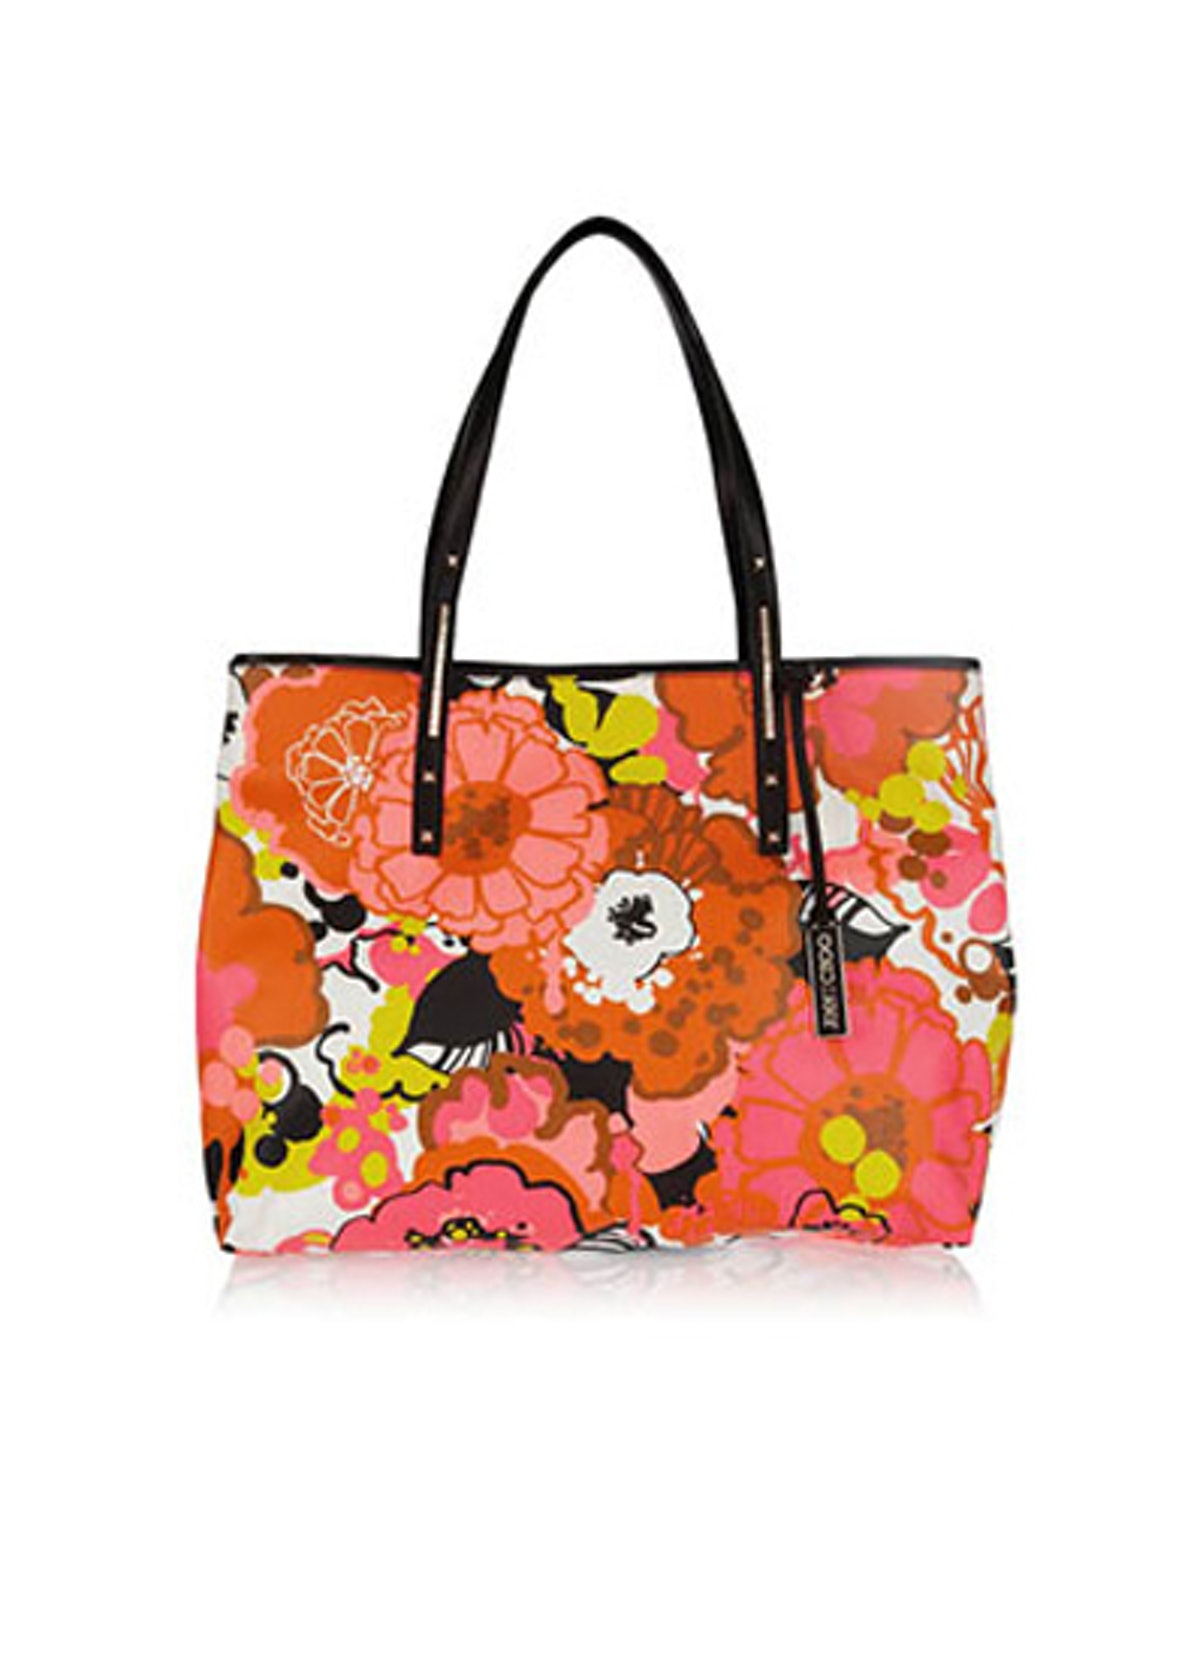 acss-floral-pieces-05-v.jpg